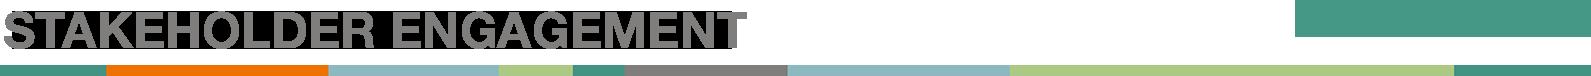 WDP Stakeholder engagement - NL